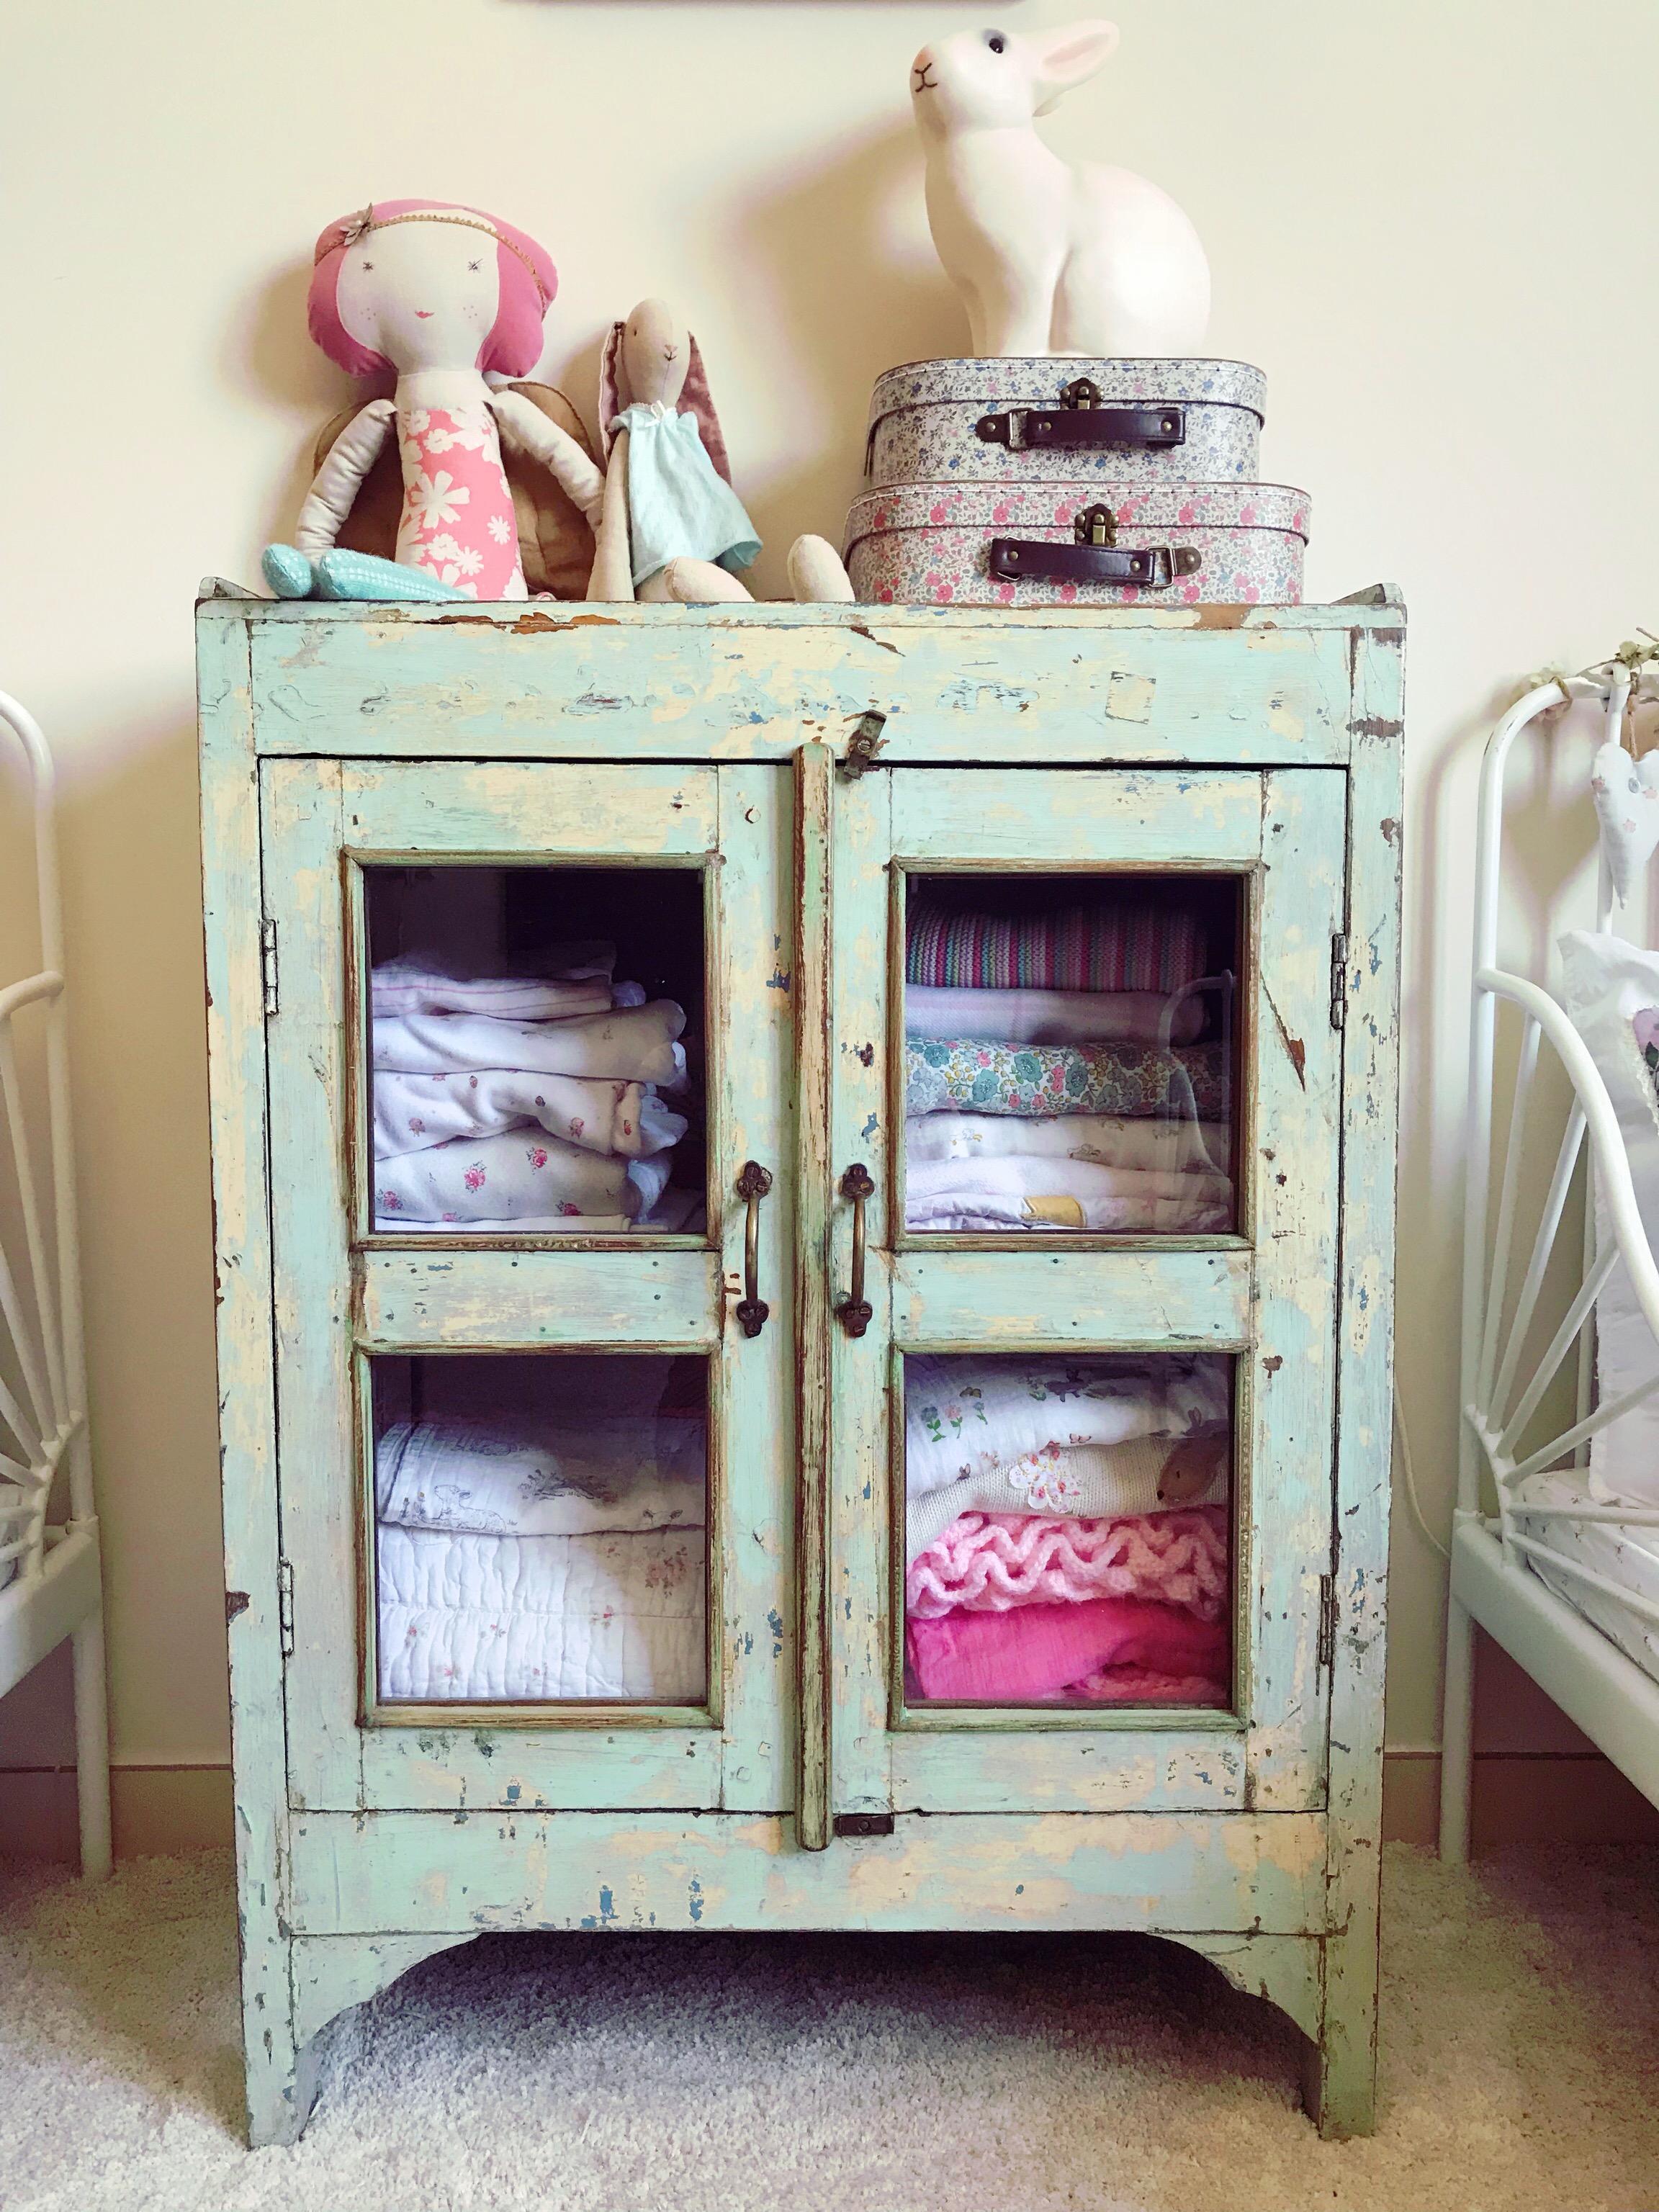 Cabinet U2013 Pinky Furniture (Instagram@pinkyfurniture)